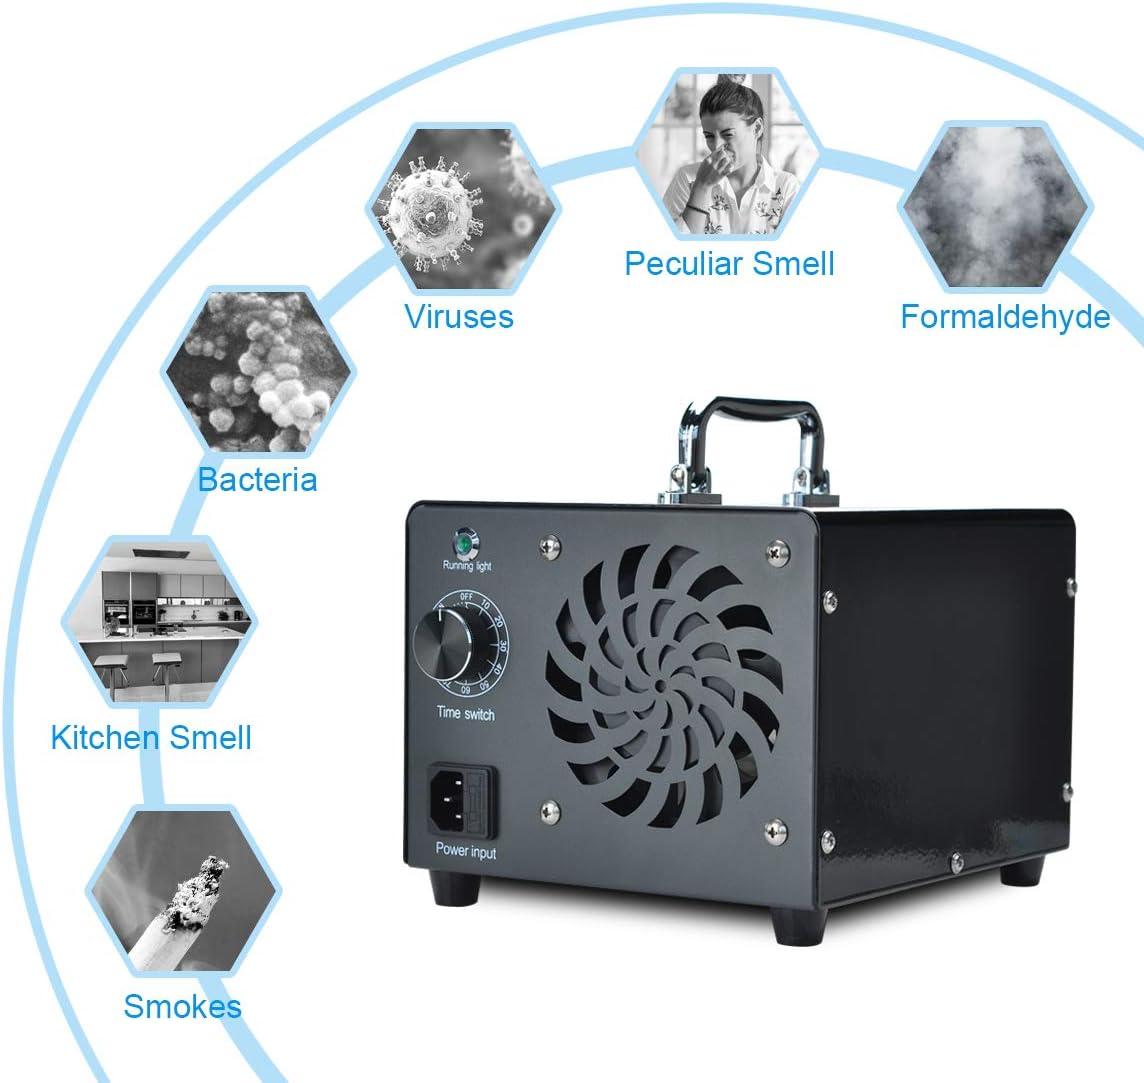 la oficina comercial 10000 mg // h 80W O3 M/áquina Ionizador de aire para el hogar Purificador de aire M/áquina desodorizadora para el hogar la cocina Generador de ozono Podazz Amarillo